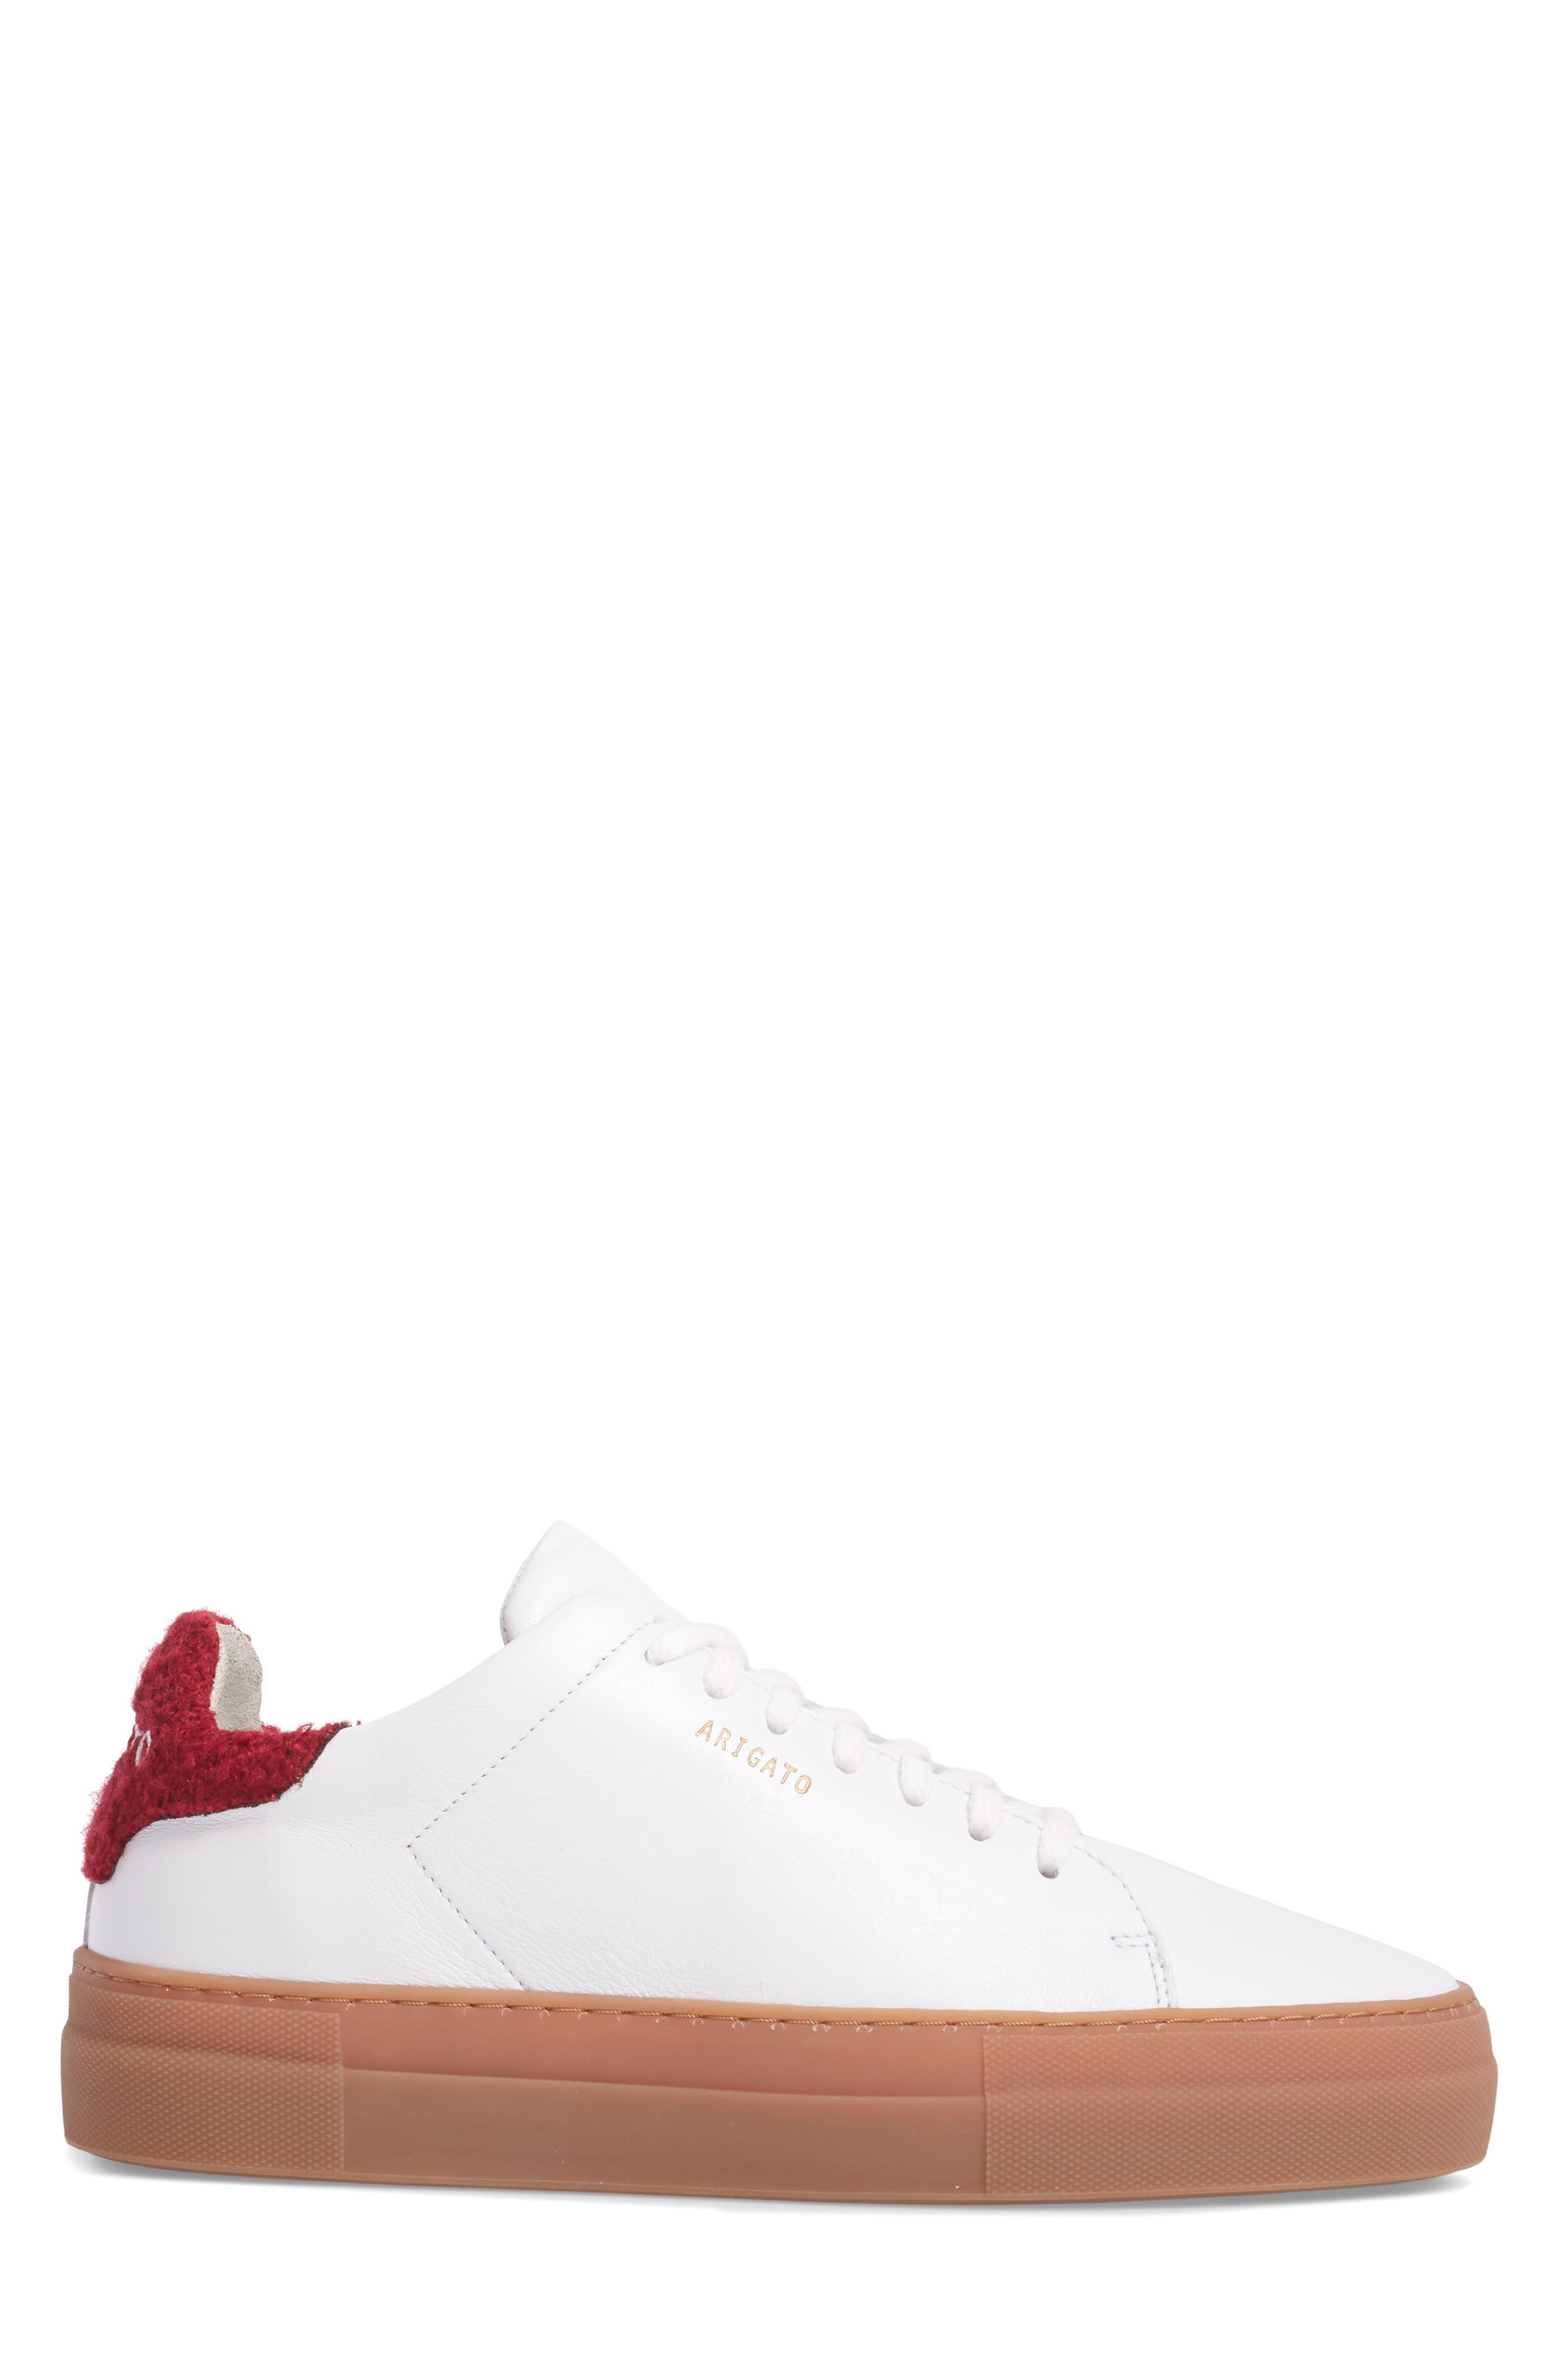 Clean 360 Fuzzy Heel Sneaker,                             Alternate thumbnail 3, color,                             100